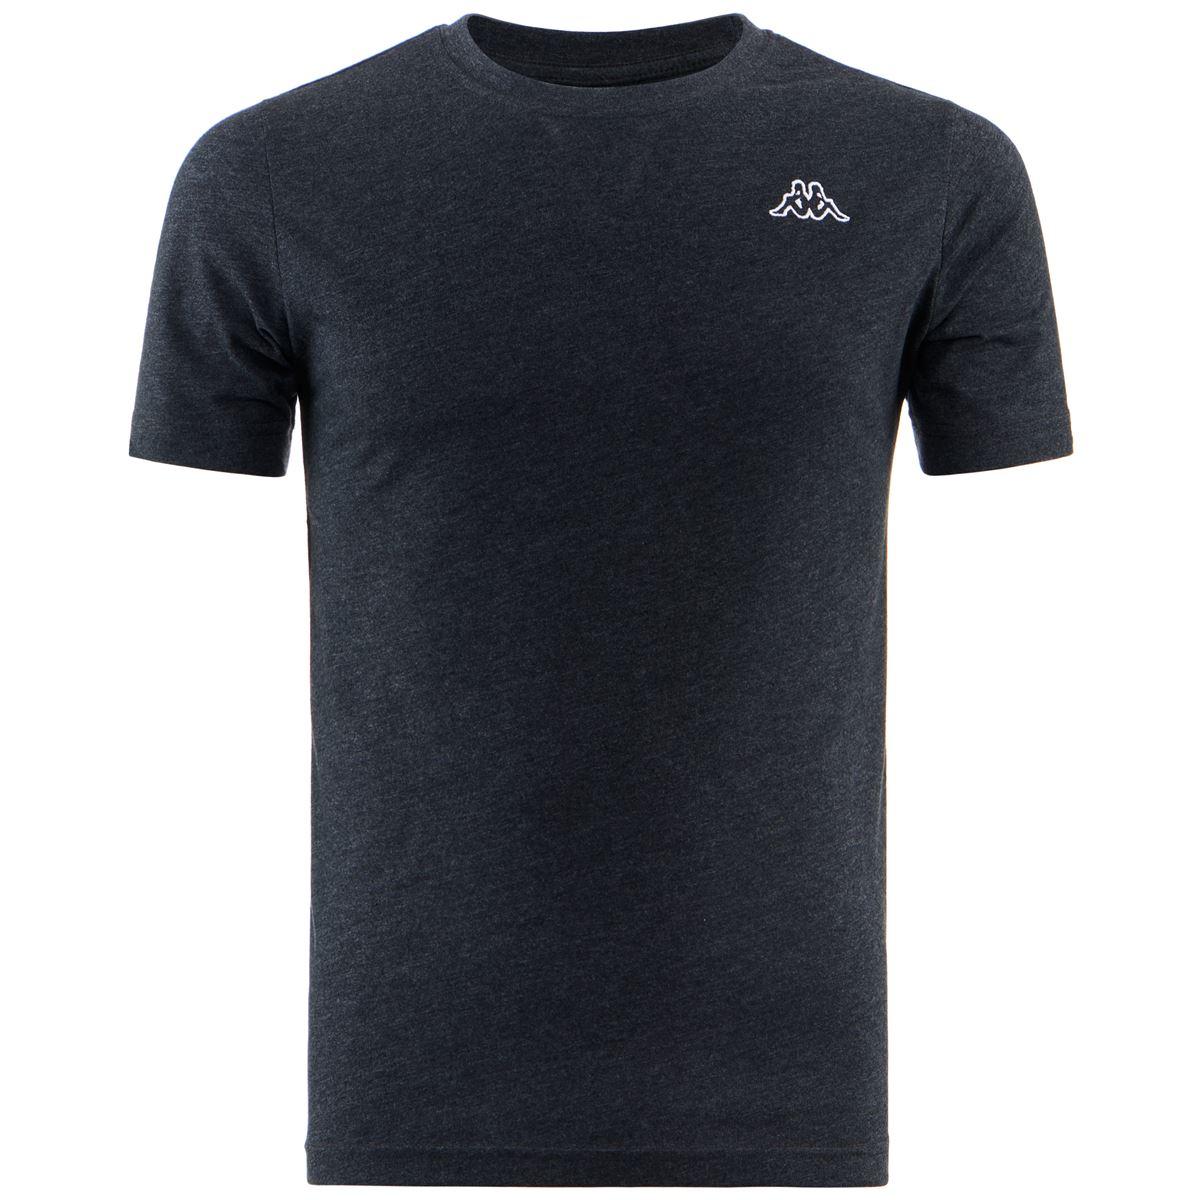 T-SHIRT KAPPA KAPPA | T-shirt m/m | 304J15018M